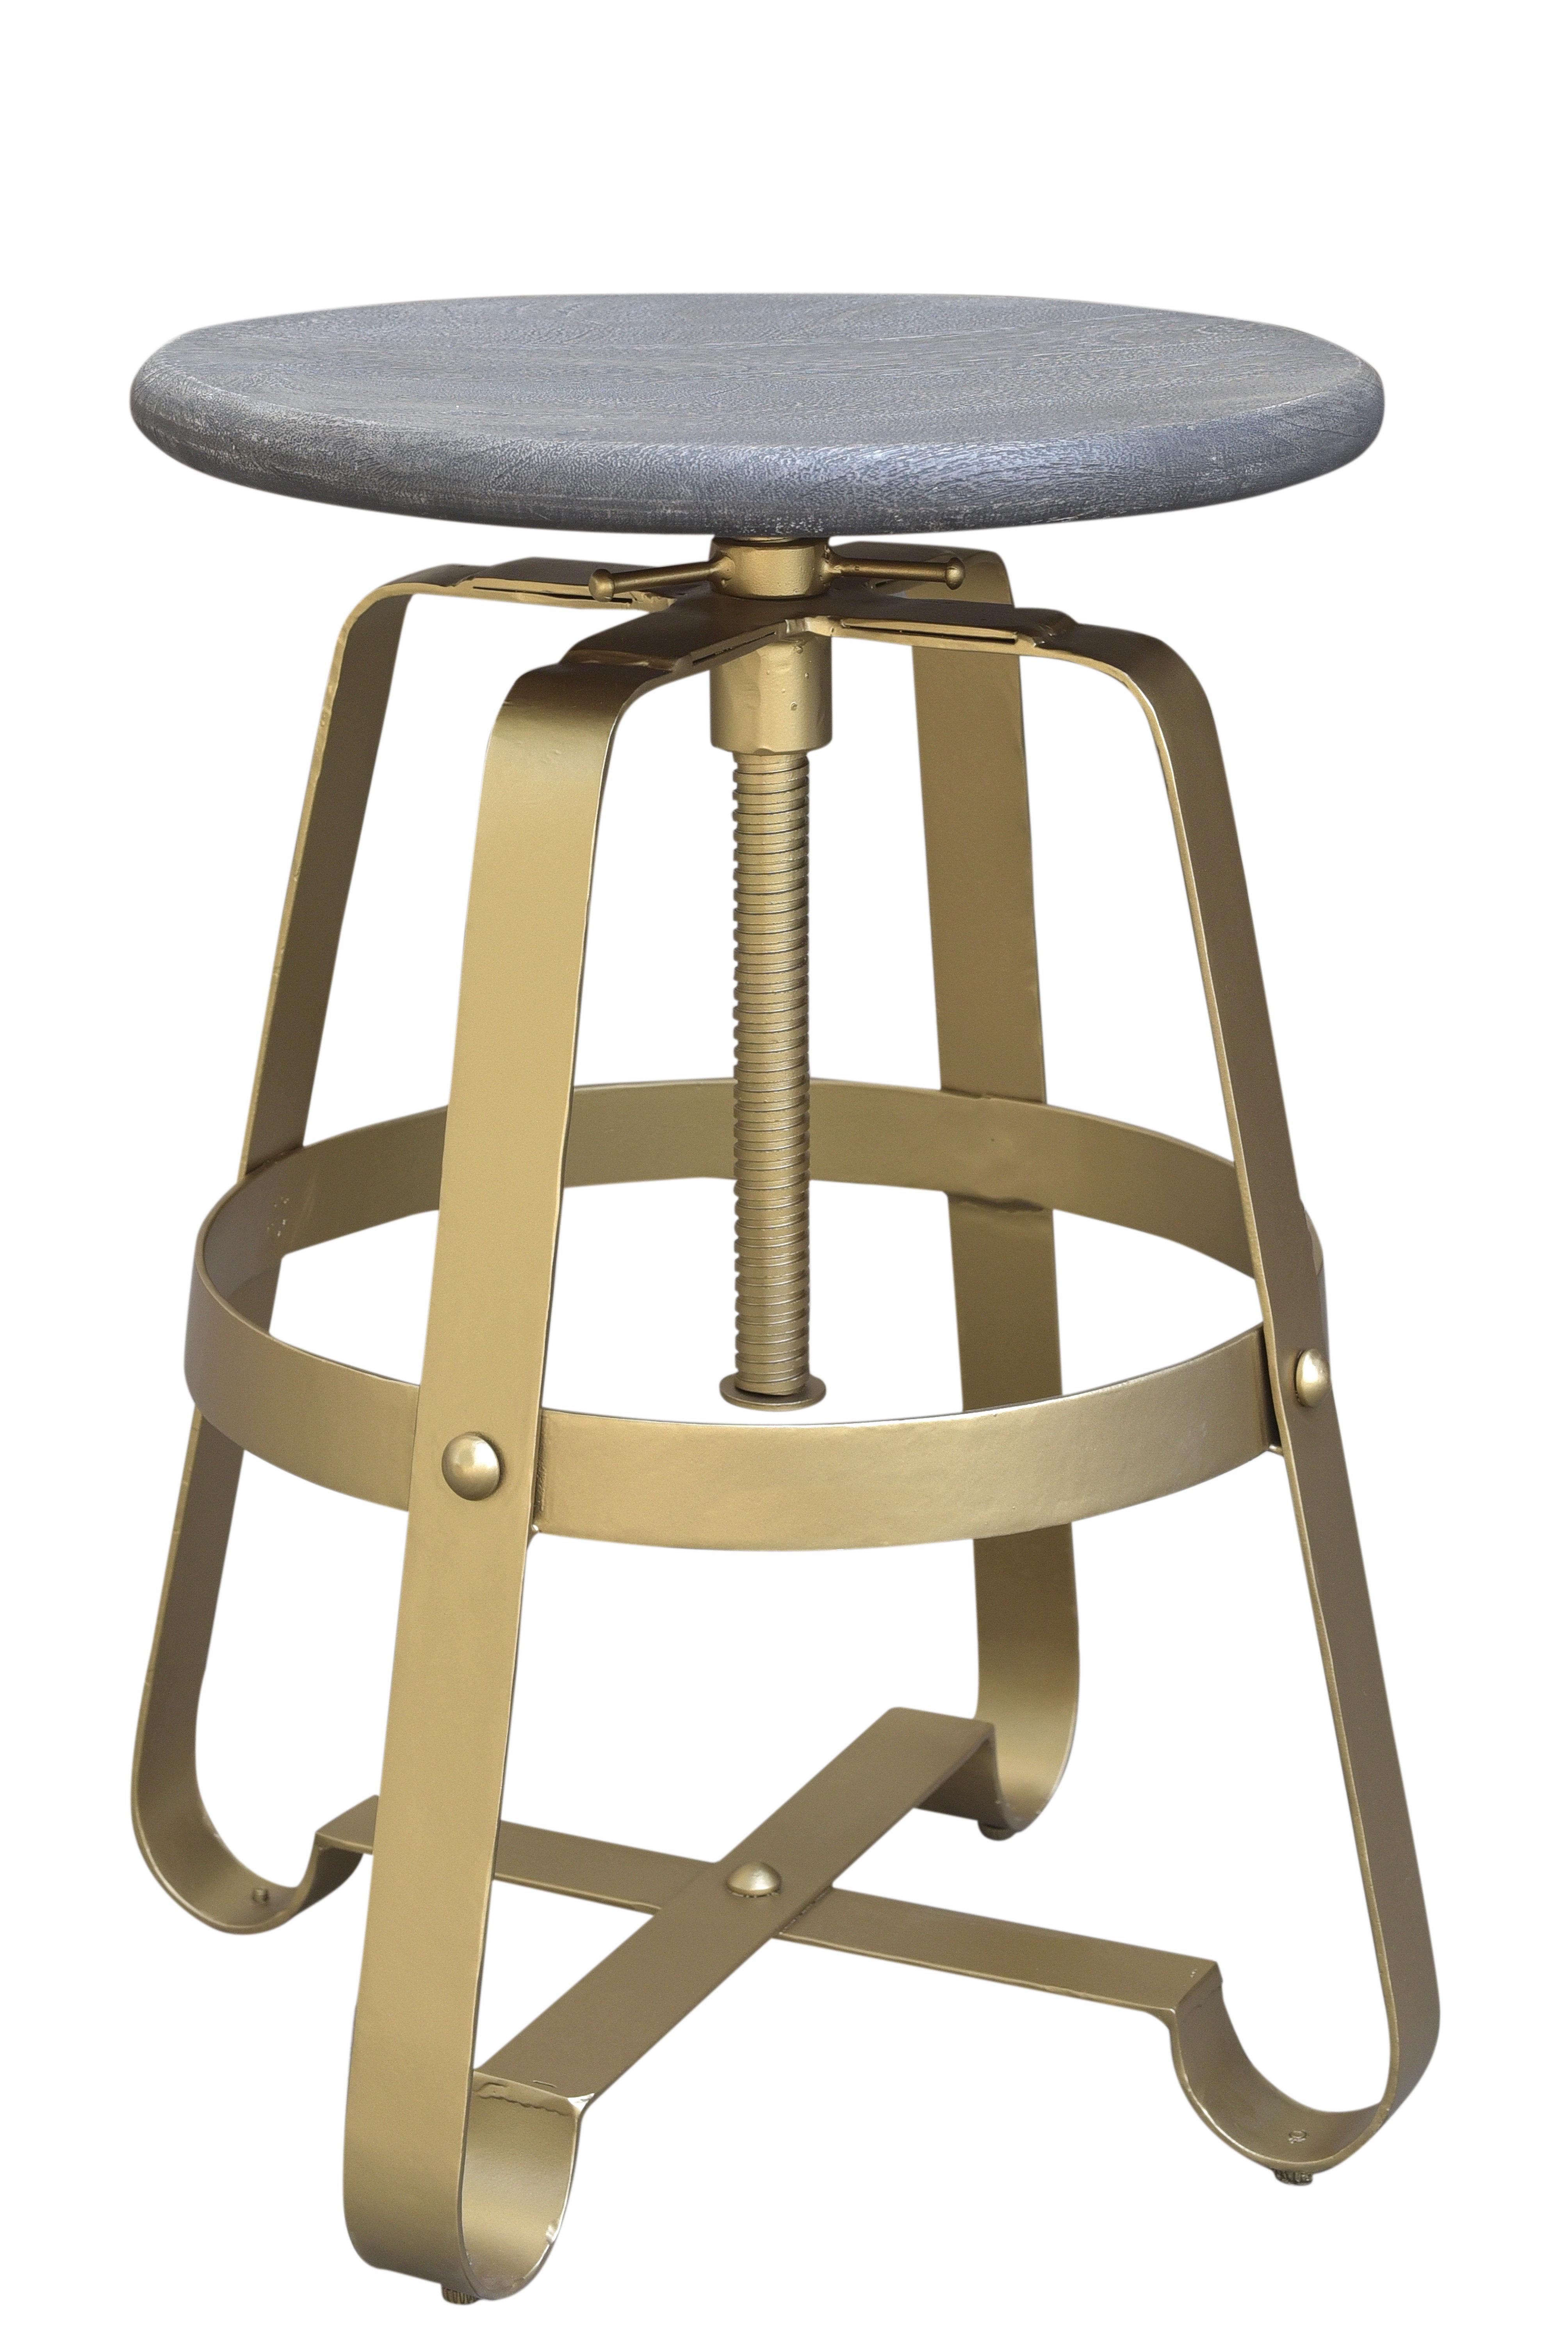 Tremendous Siller Adjustable Height Swivel Bar Stool Beatyapartments Chair Design Images Beatyapartmentscom